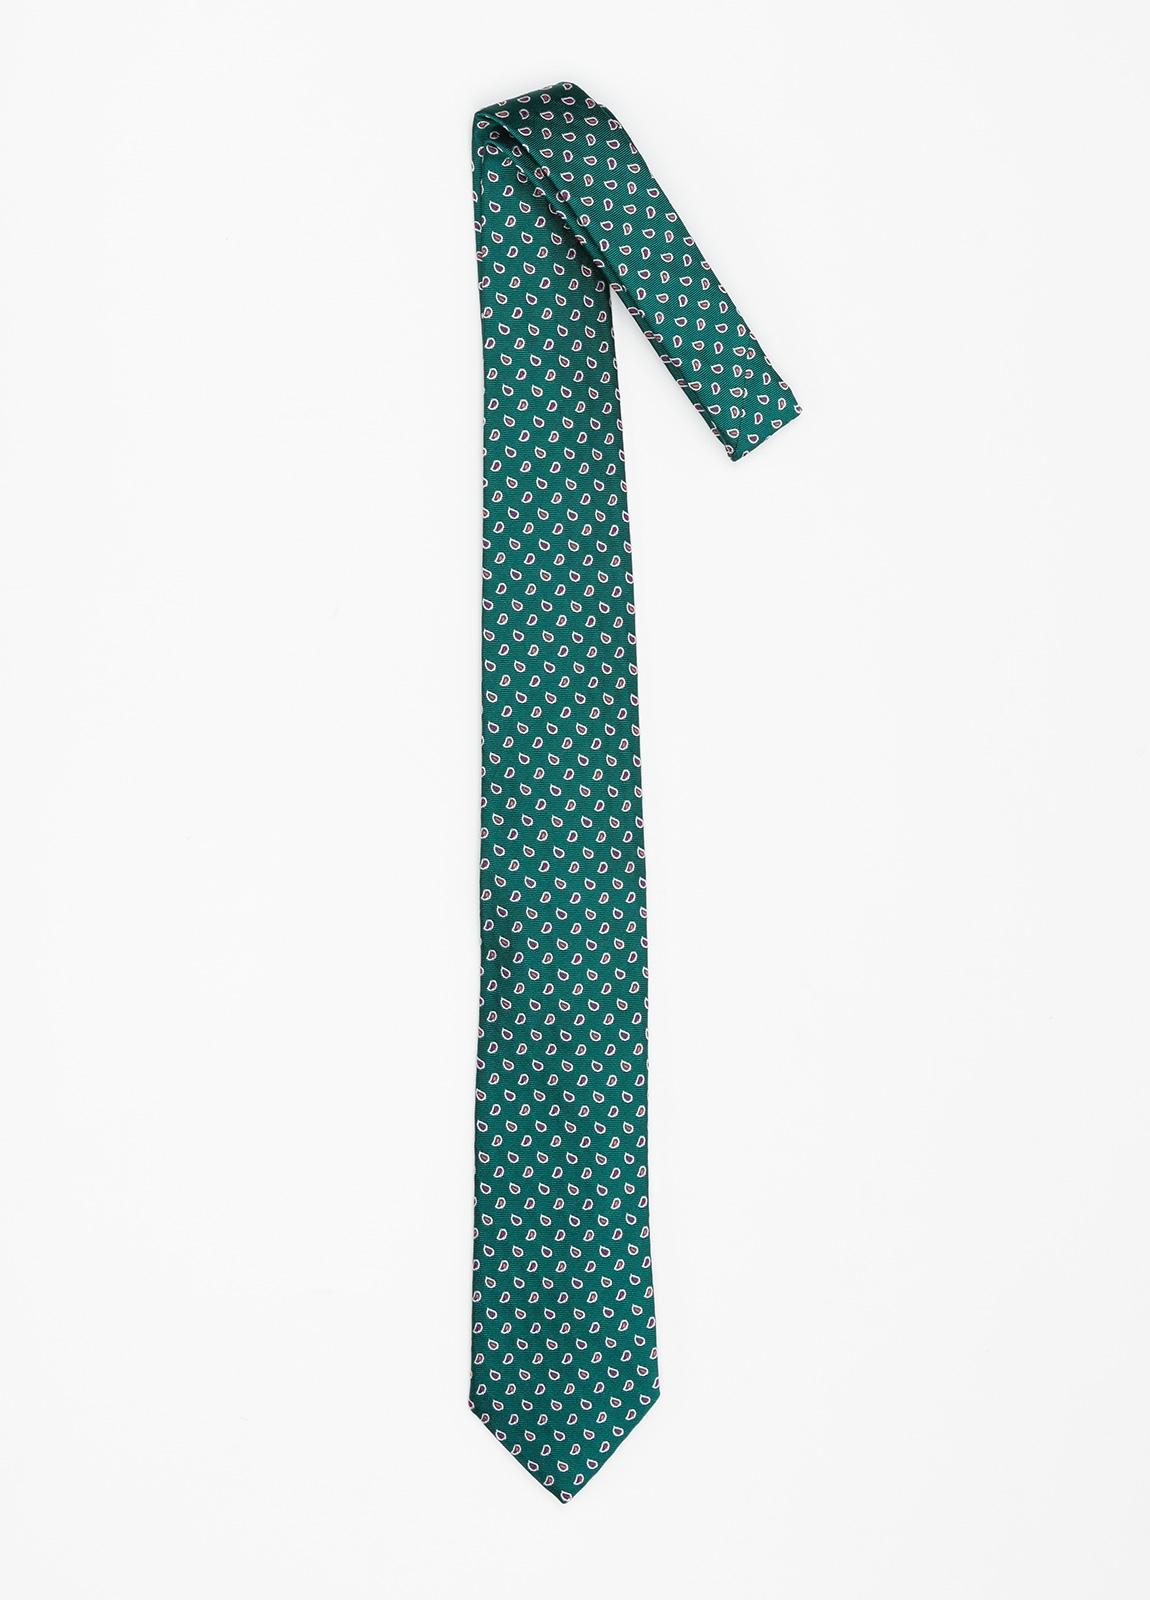 Corbata Formal Wear dibujo cachemir color verde. Pala 7,5 cm. 100% Seda. - Ítem1